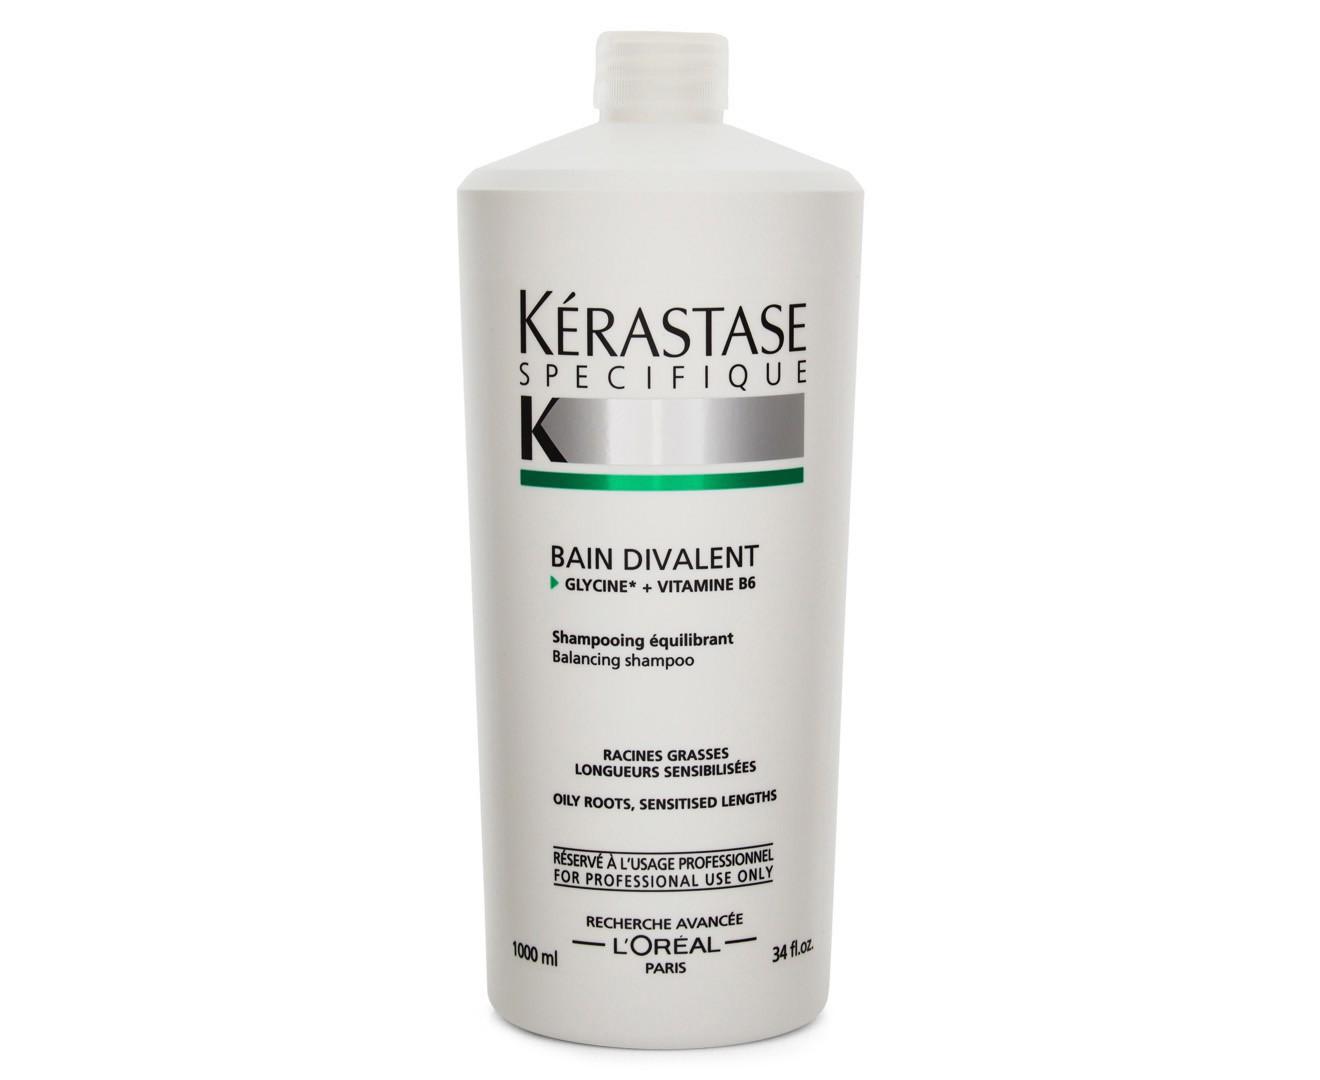 Kérastase Specifique Bain Divalent Shampoo - 1L - CA